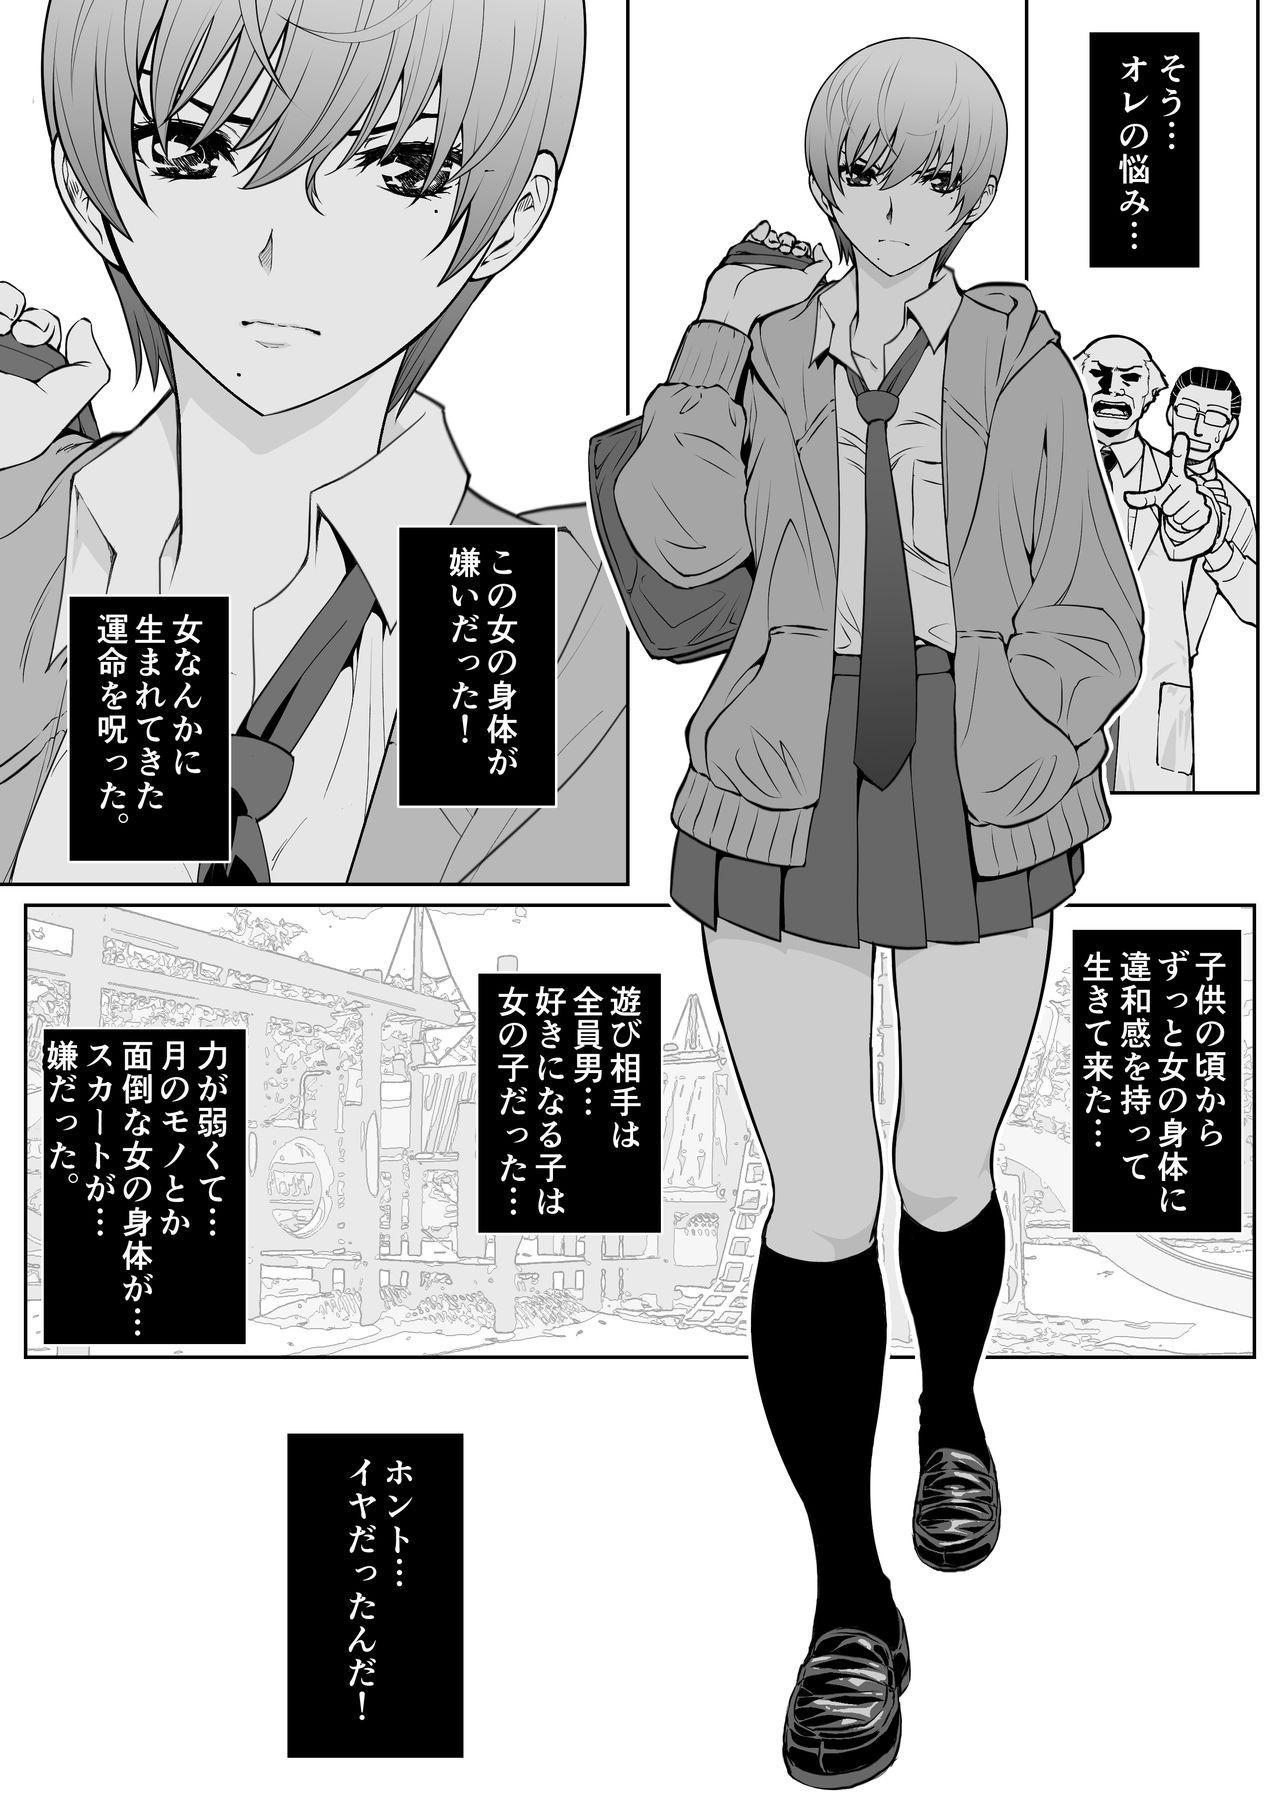 Namaiki mmusume ni tsuyo ● ikīki jugyō 6